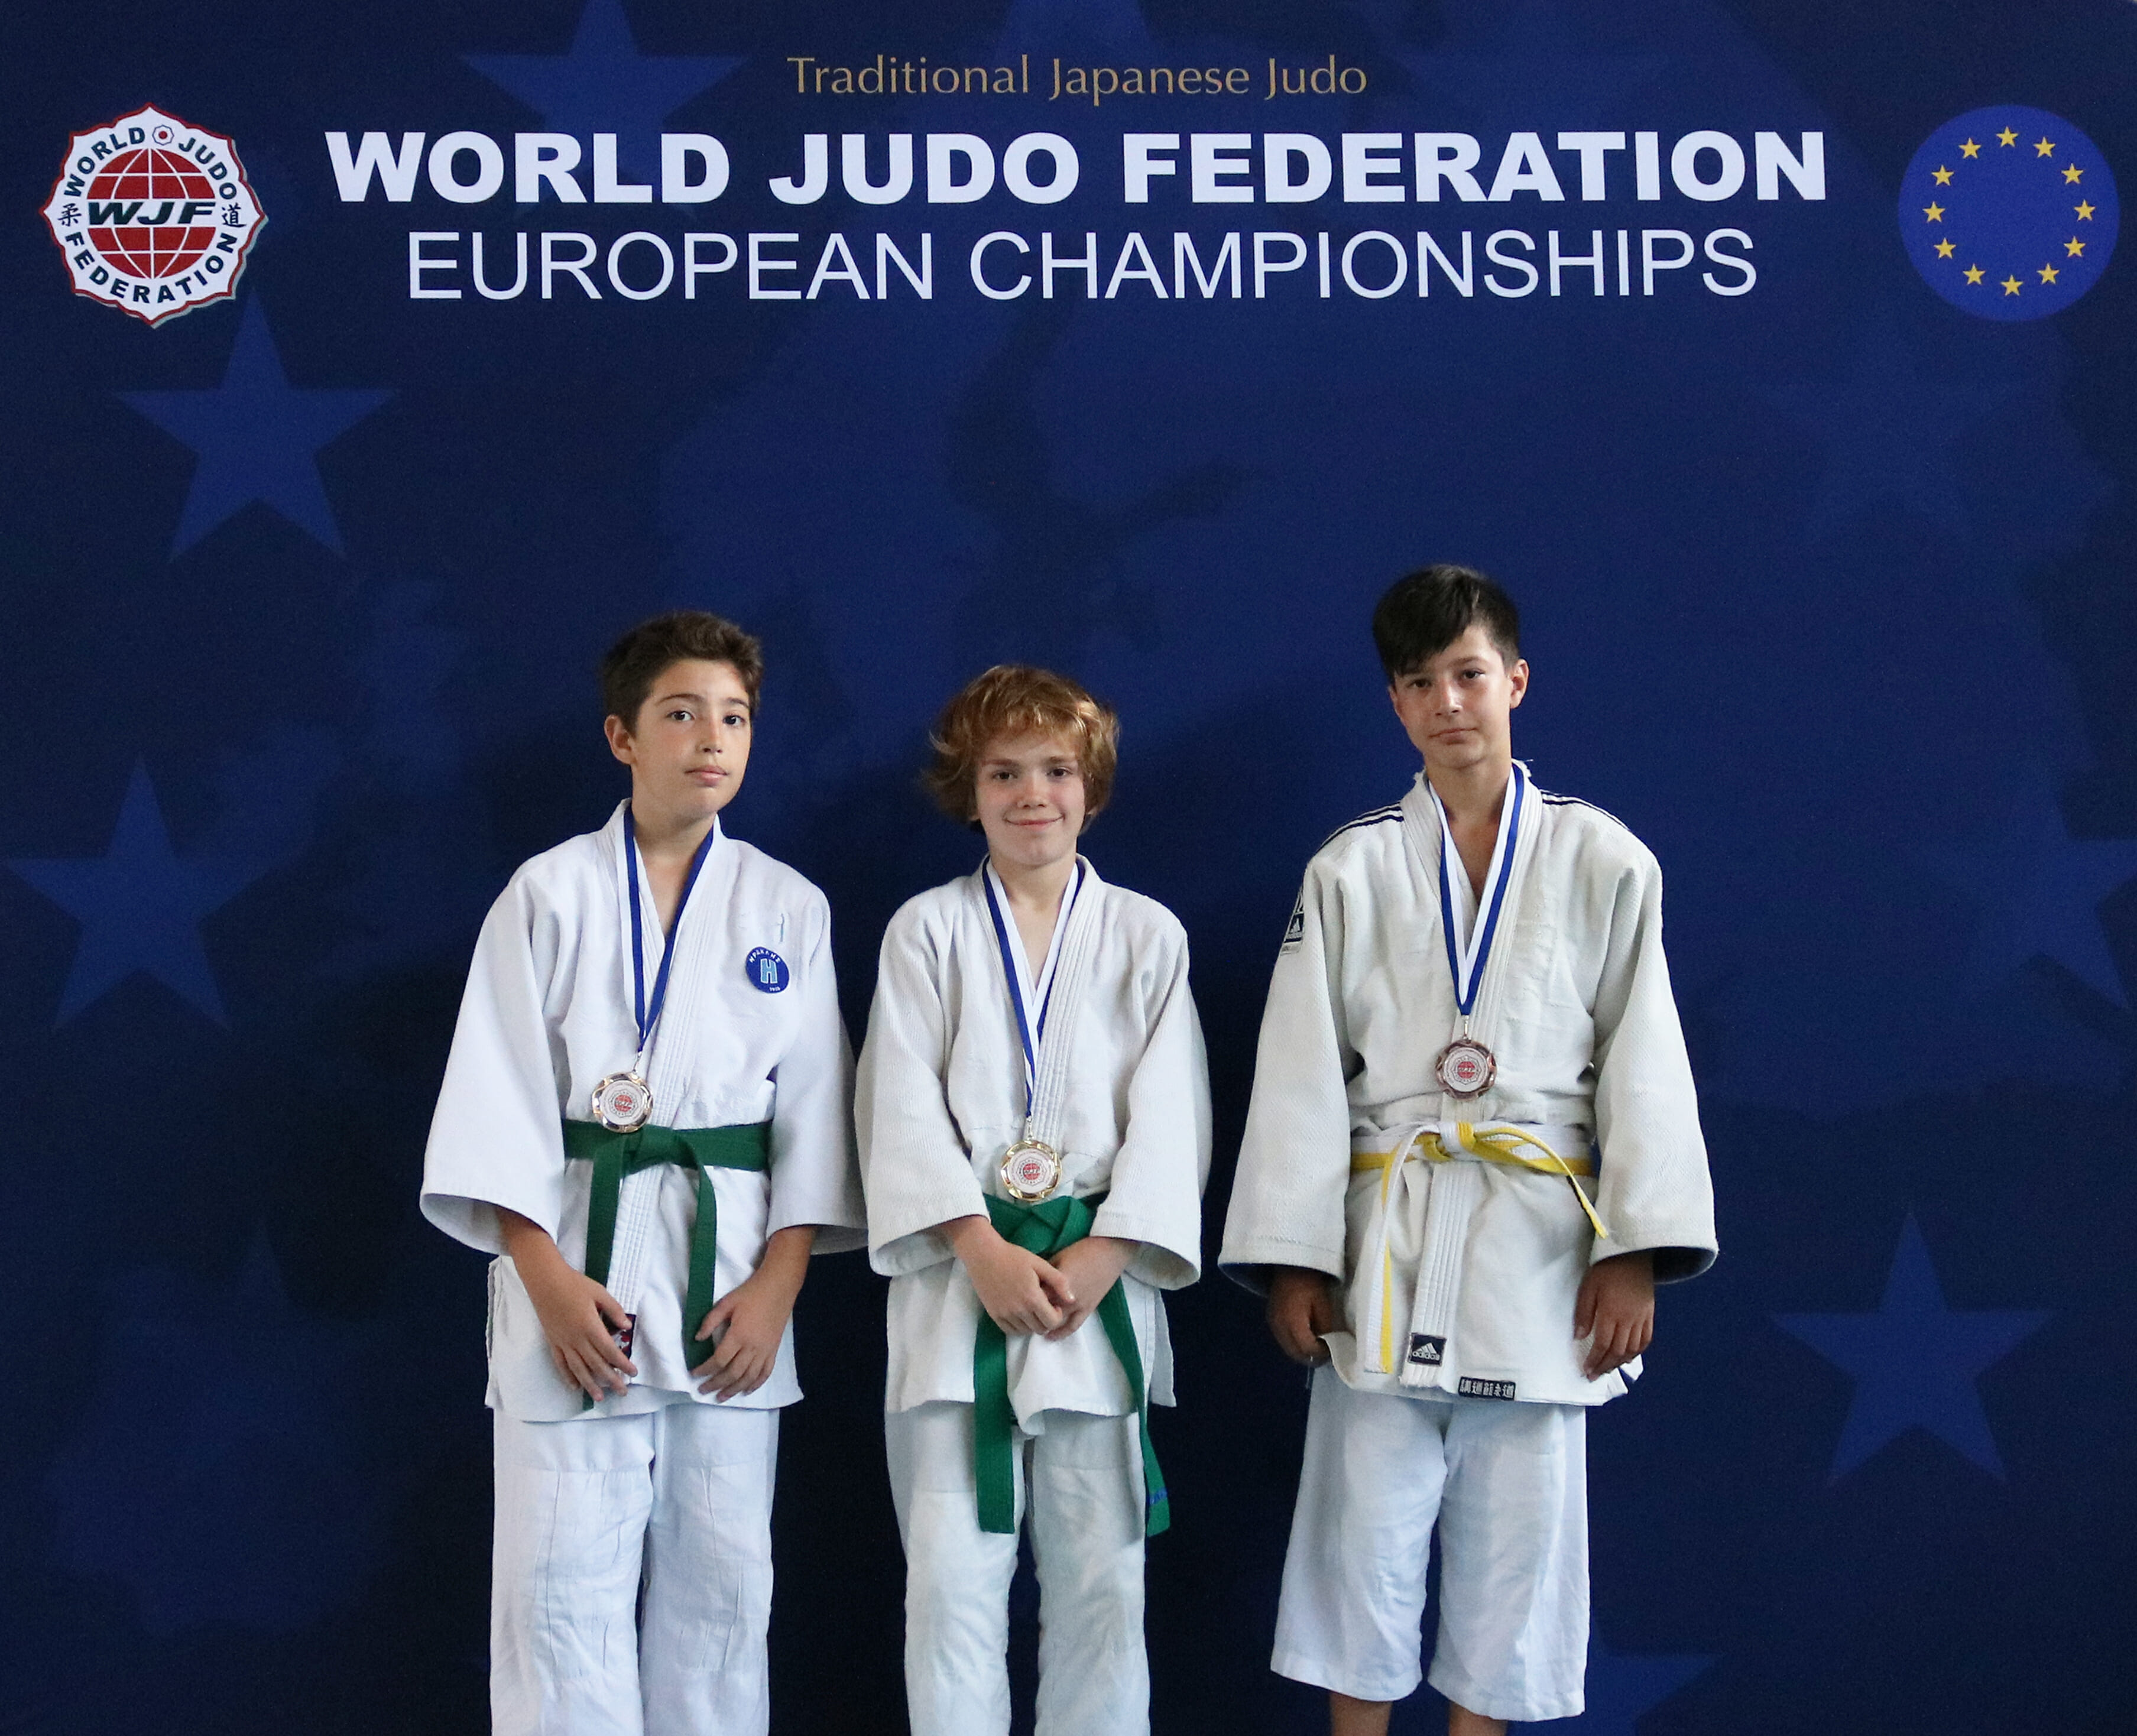 Sebastian wins Gold at the 2018 WJF European Championships